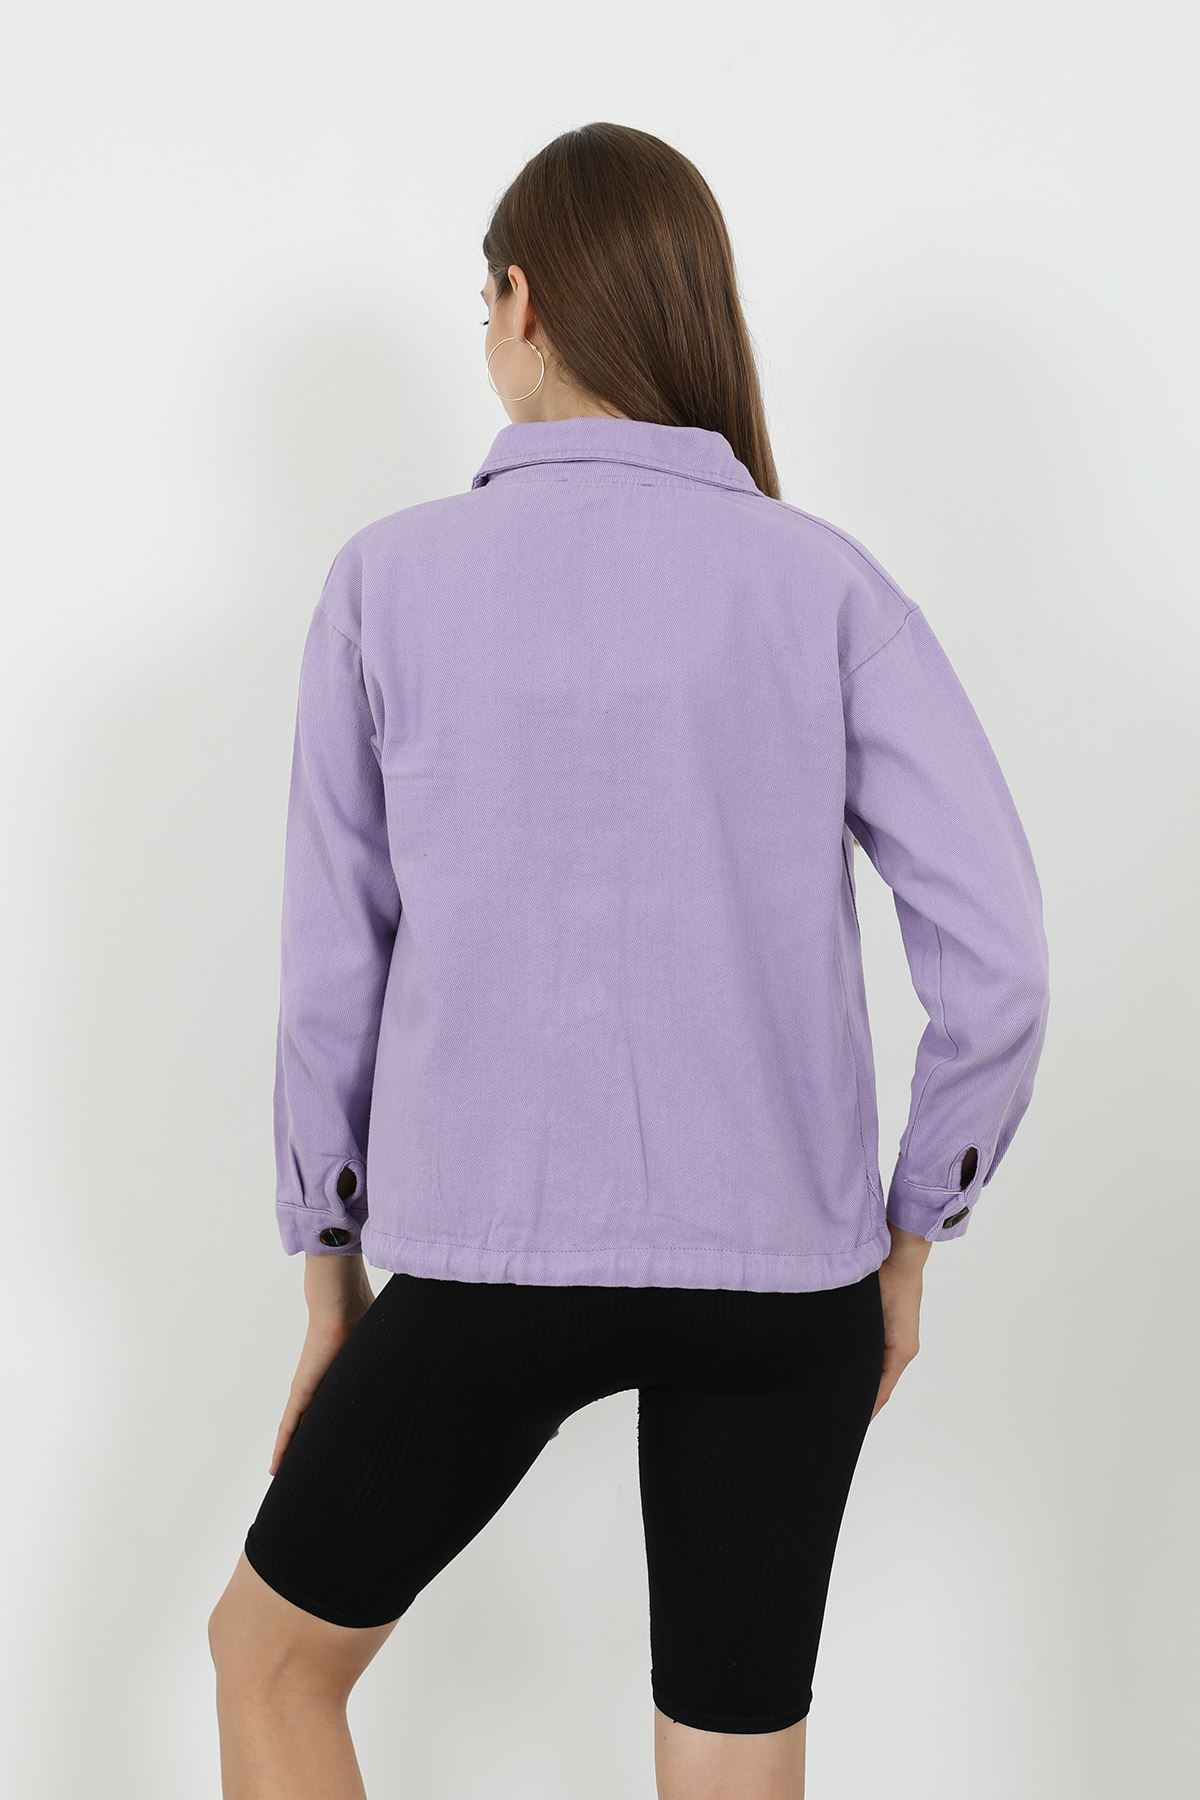 İki Cep Ceket-Lila